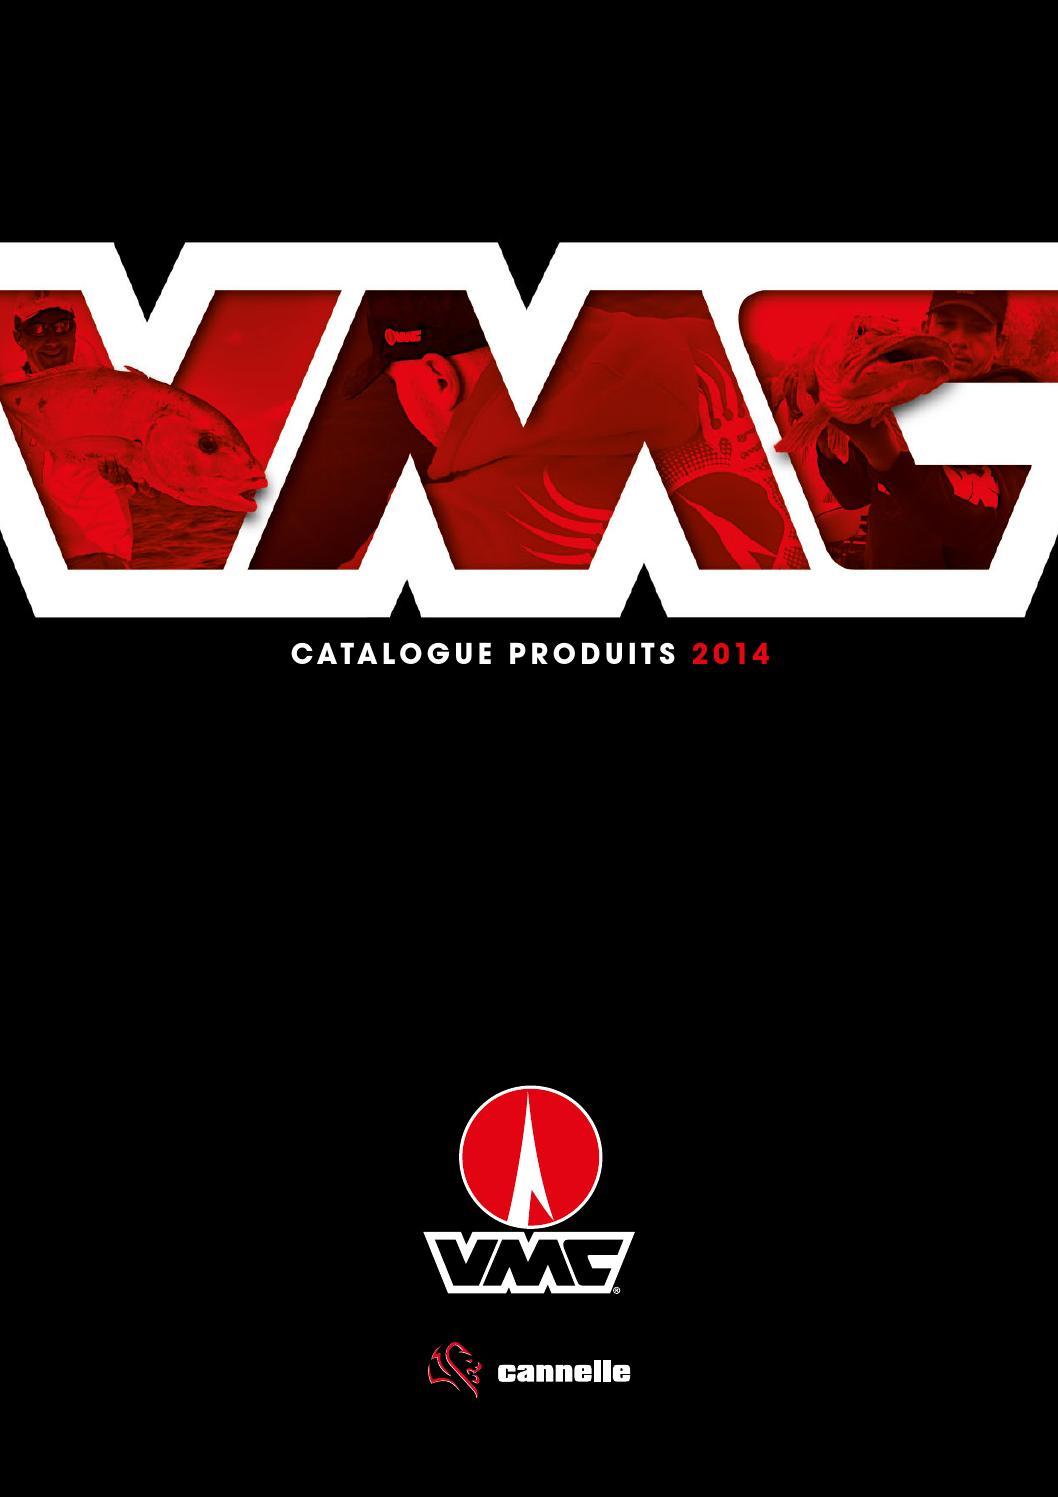 VMC 8570 BN Barbarian triplés Vanadium Différentes Tailles